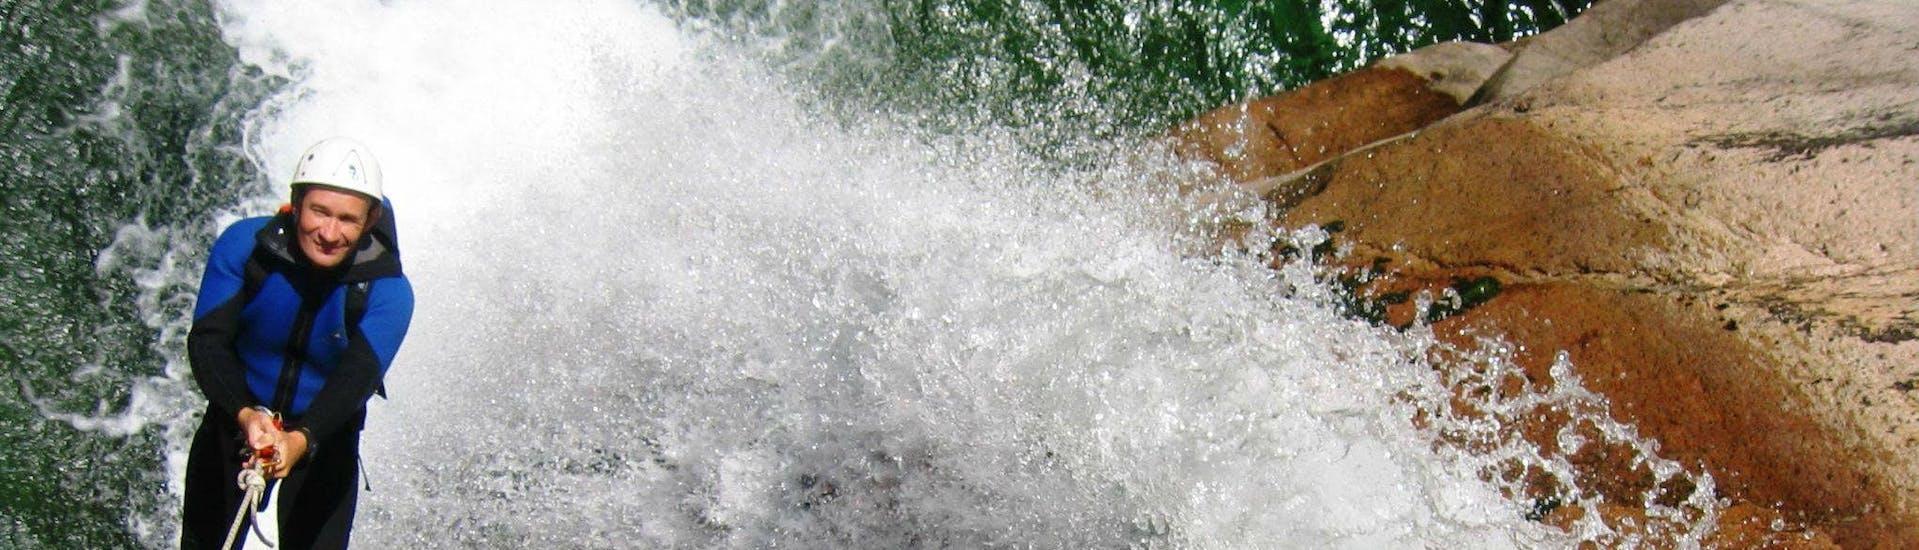 Canyoning dans le canyon de Purcaraccia - Sport